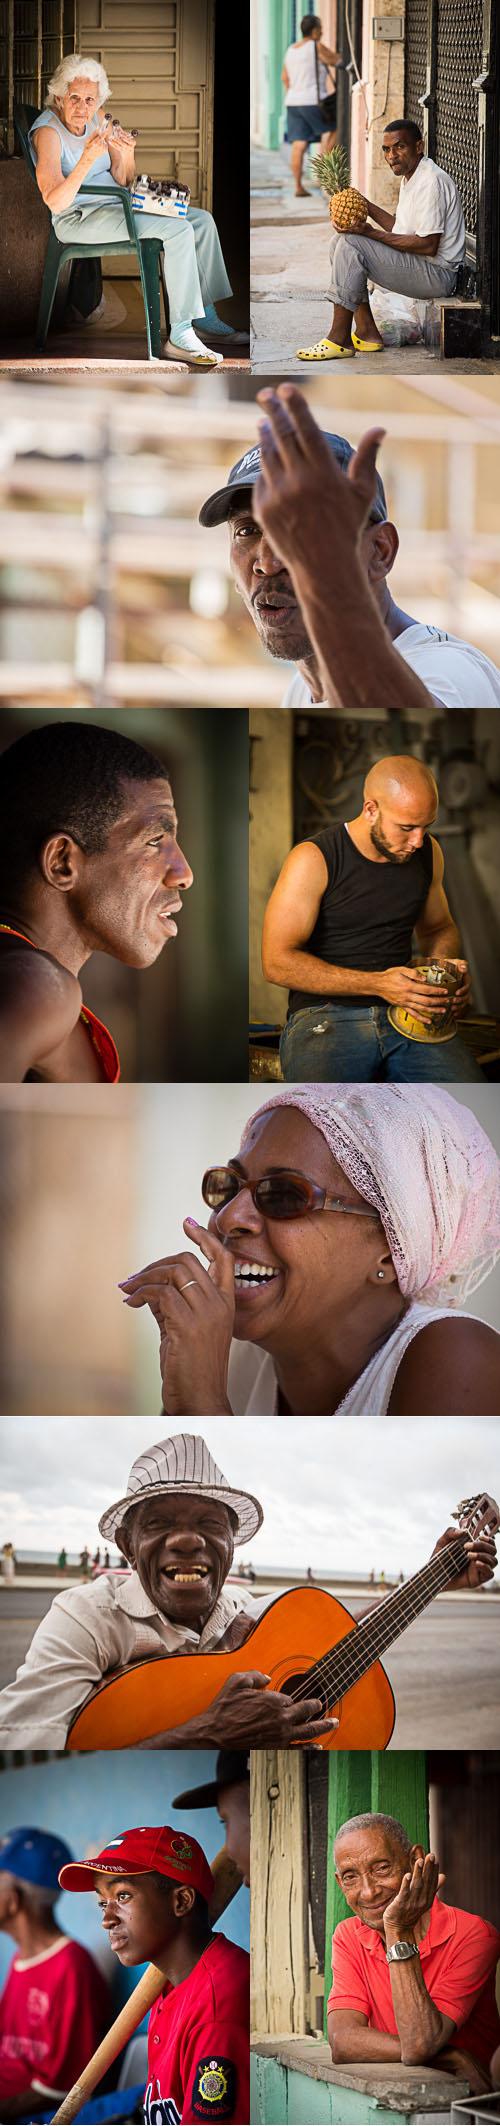 cuba-photography-people-1